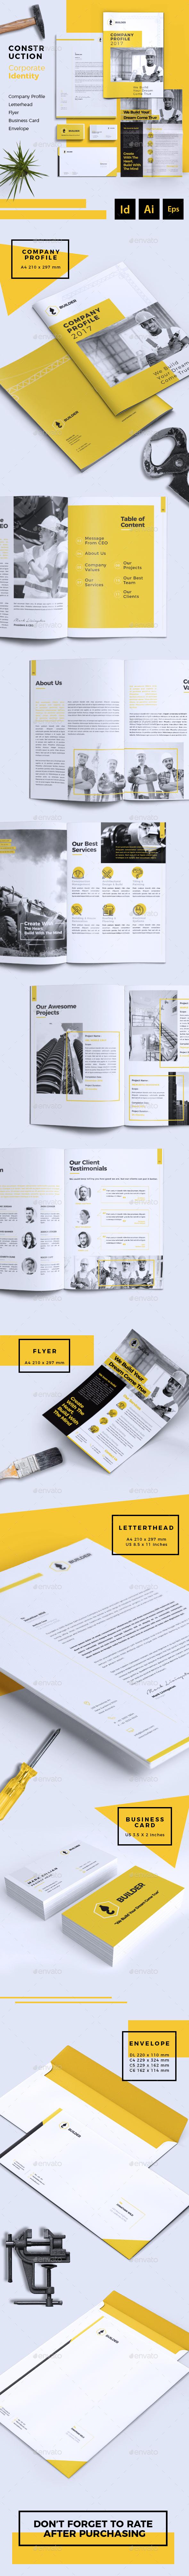 GraphicRiver Builder Construction Corporate Branding Identity 20916904